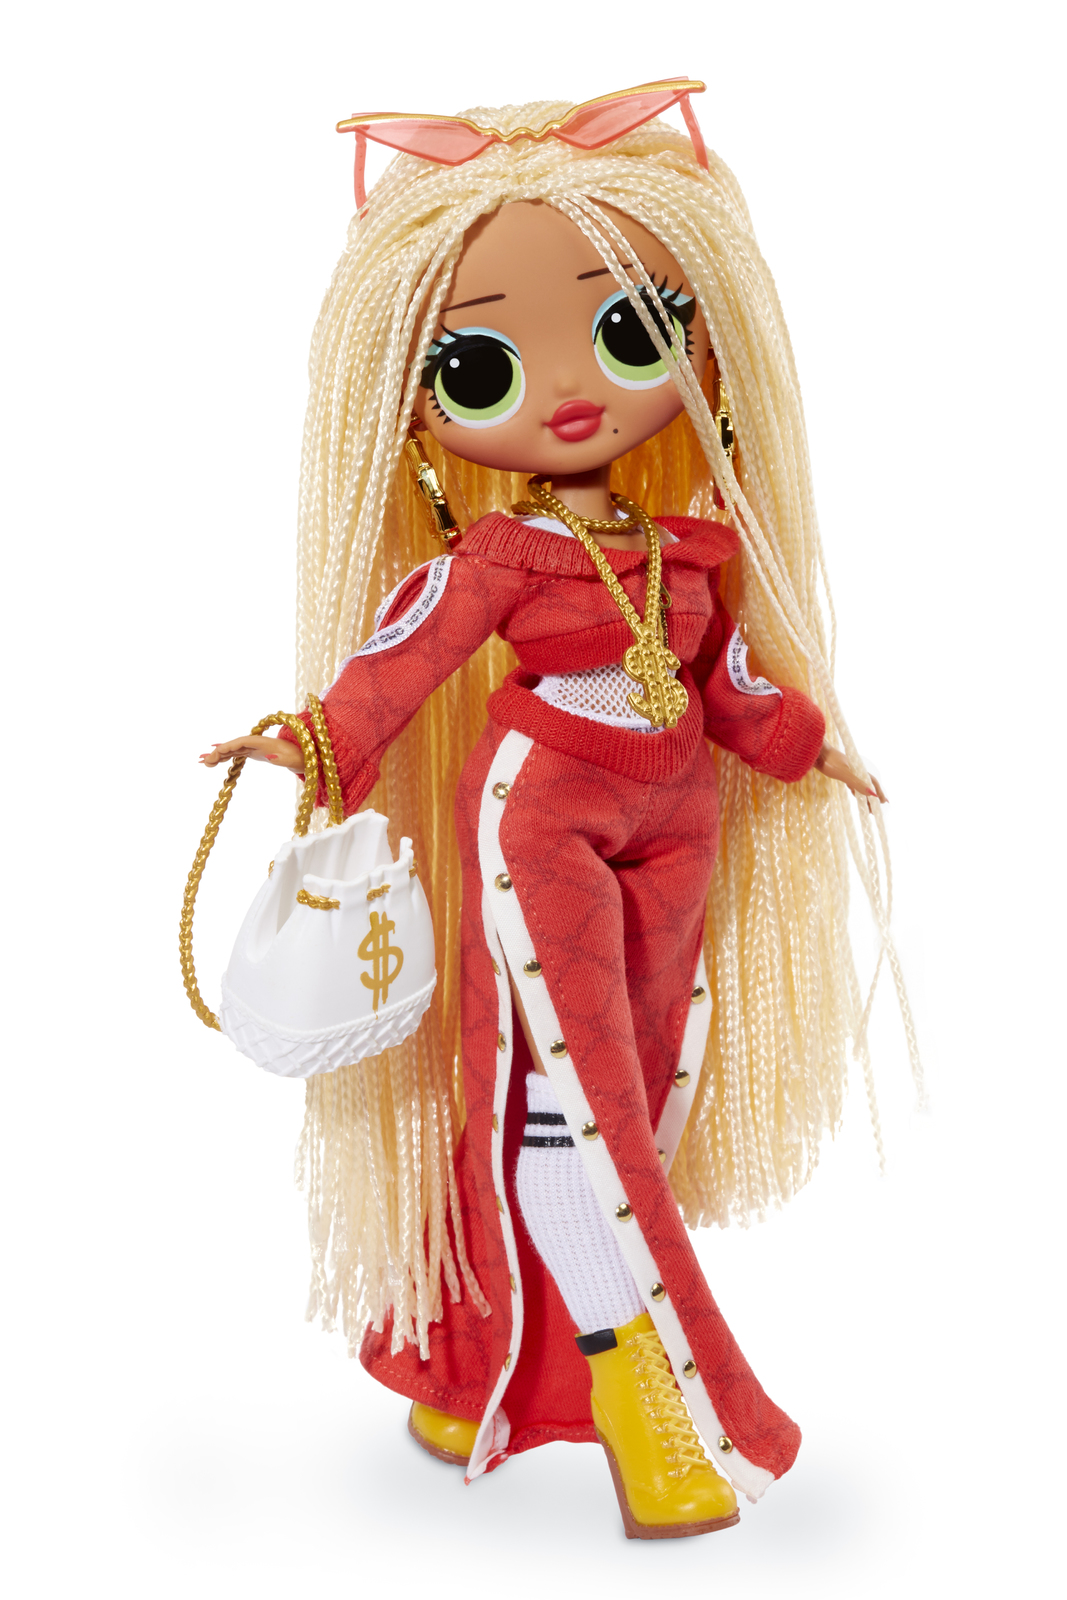 L.O.L. Surprise! - O.M.G Fashion Doll (Swag) image